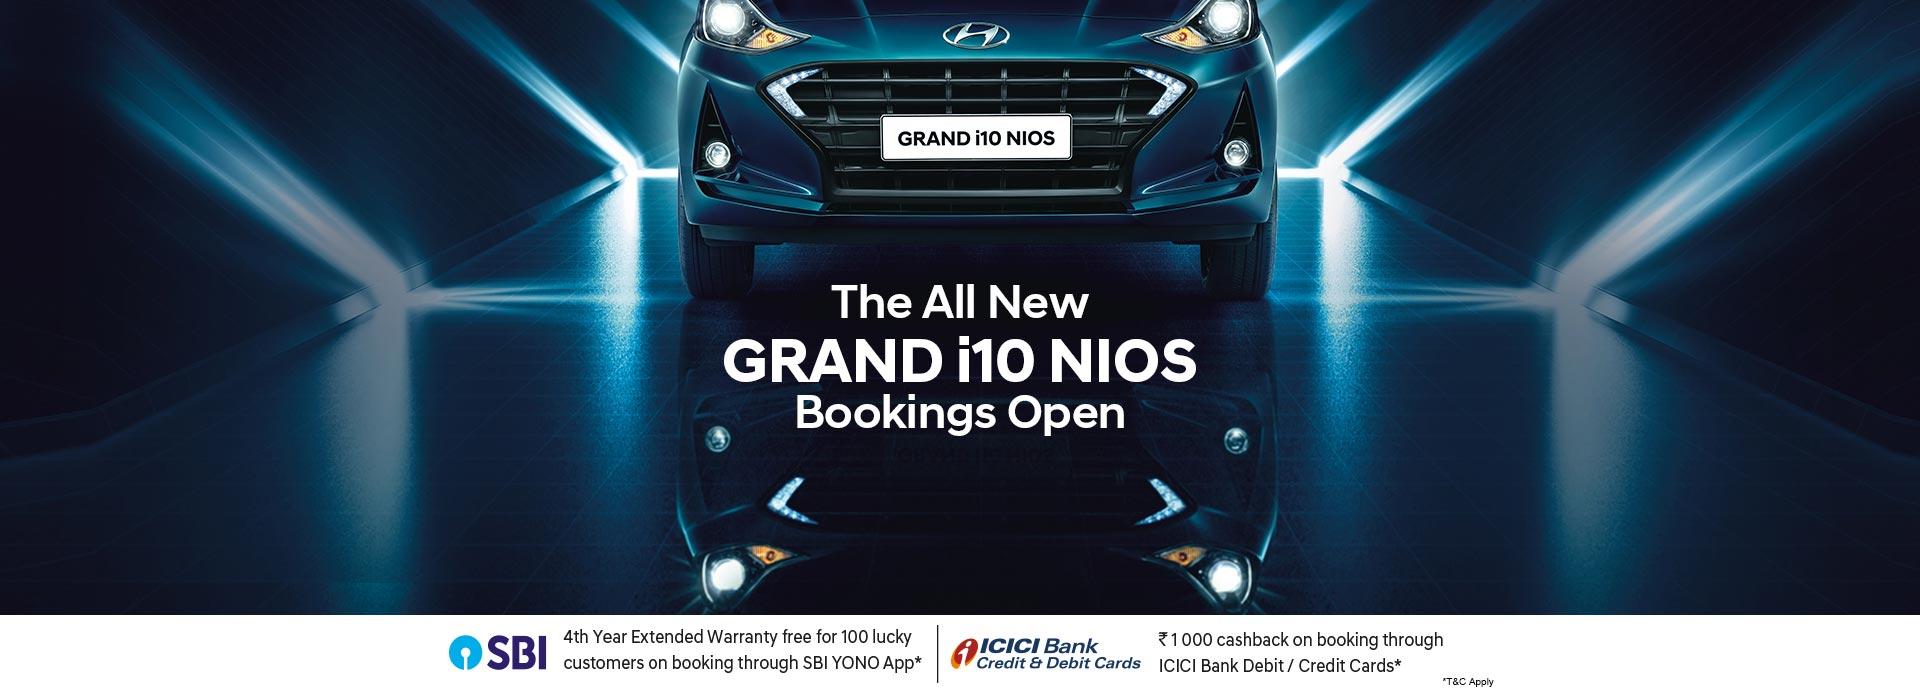 Lakshmi Hyundai: Authorized new car dealership serving and